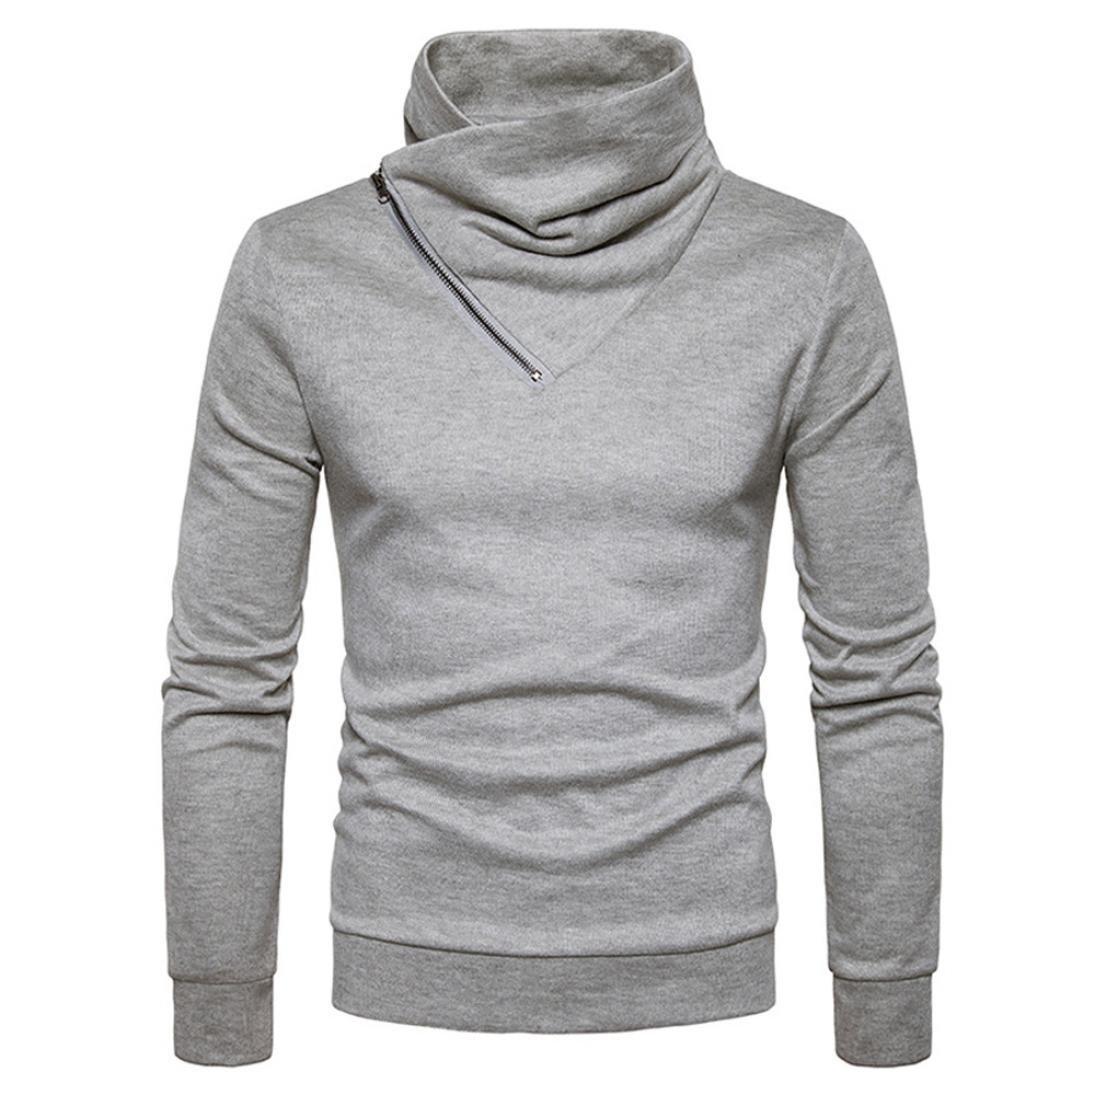 YANG-YI Mens Autumn Slim Blend Turtleneck Neck Basic Zipper Sweatshirt Sweats